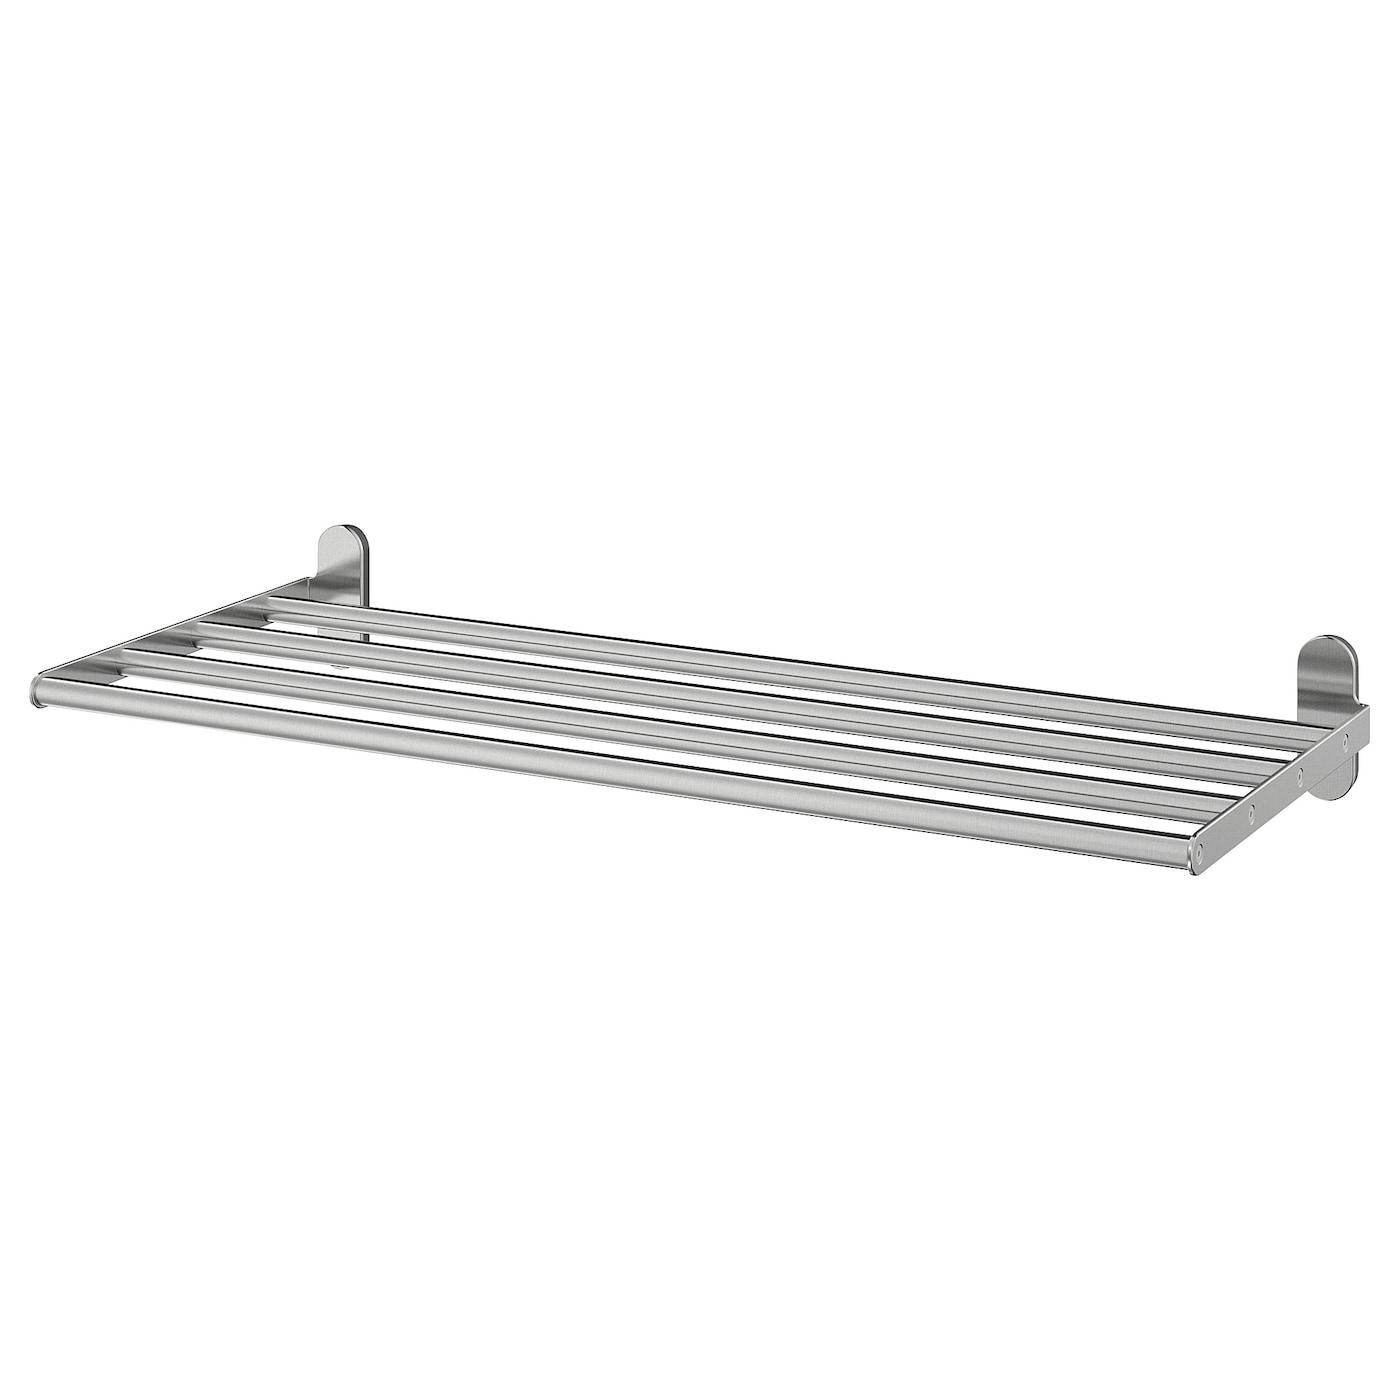 BROGRUND Wandbord/Handtuchhalter - Edelstahl - IKEA